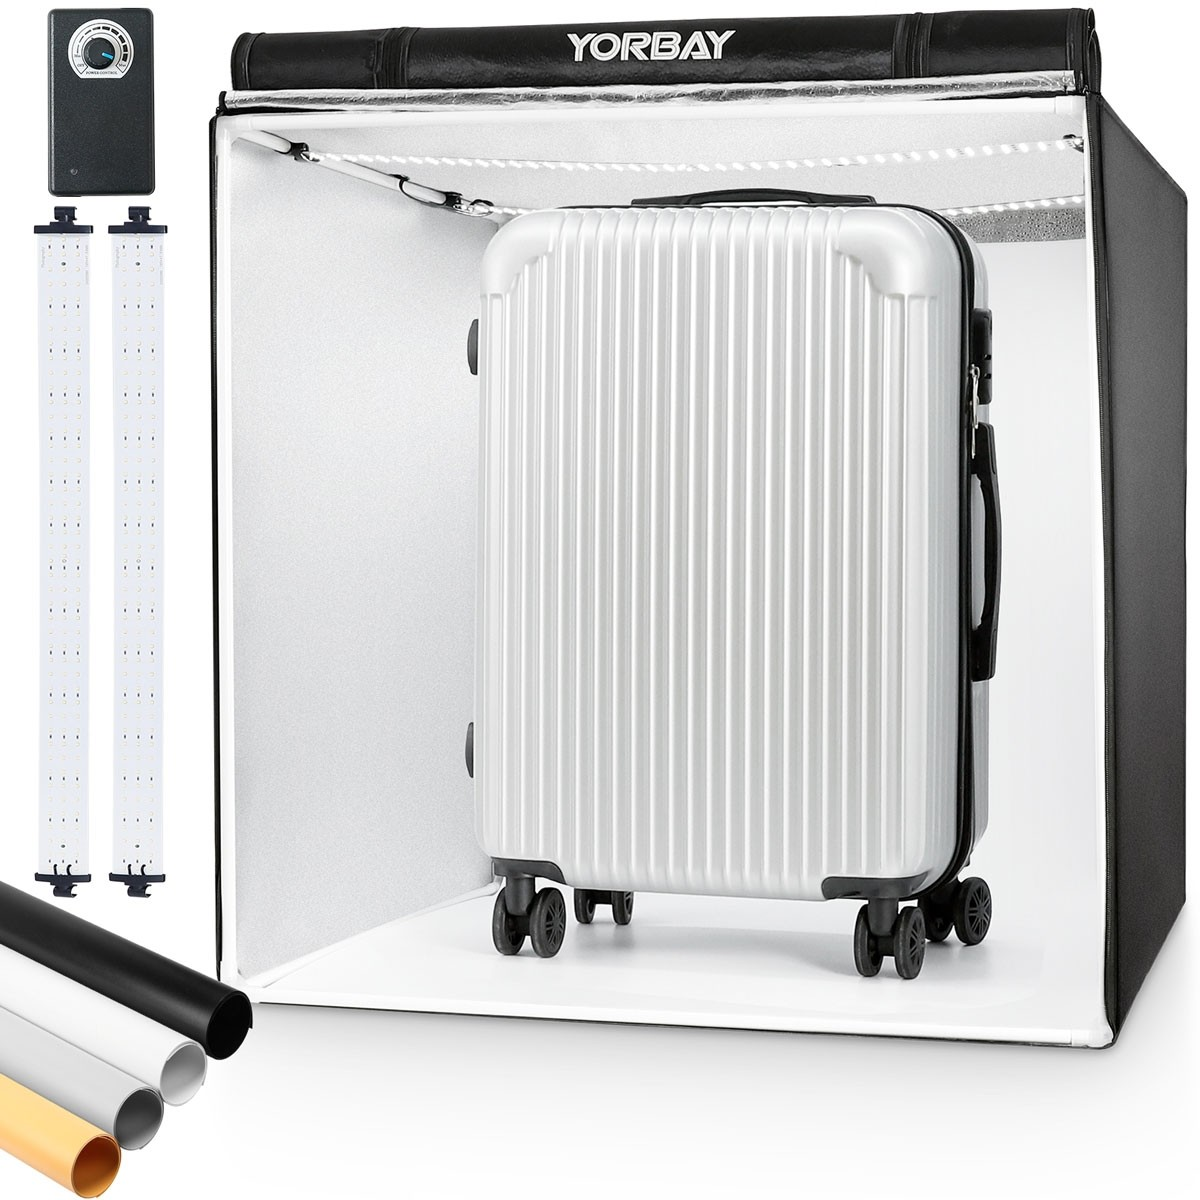 LED-fotobox-f154-yorbay-1